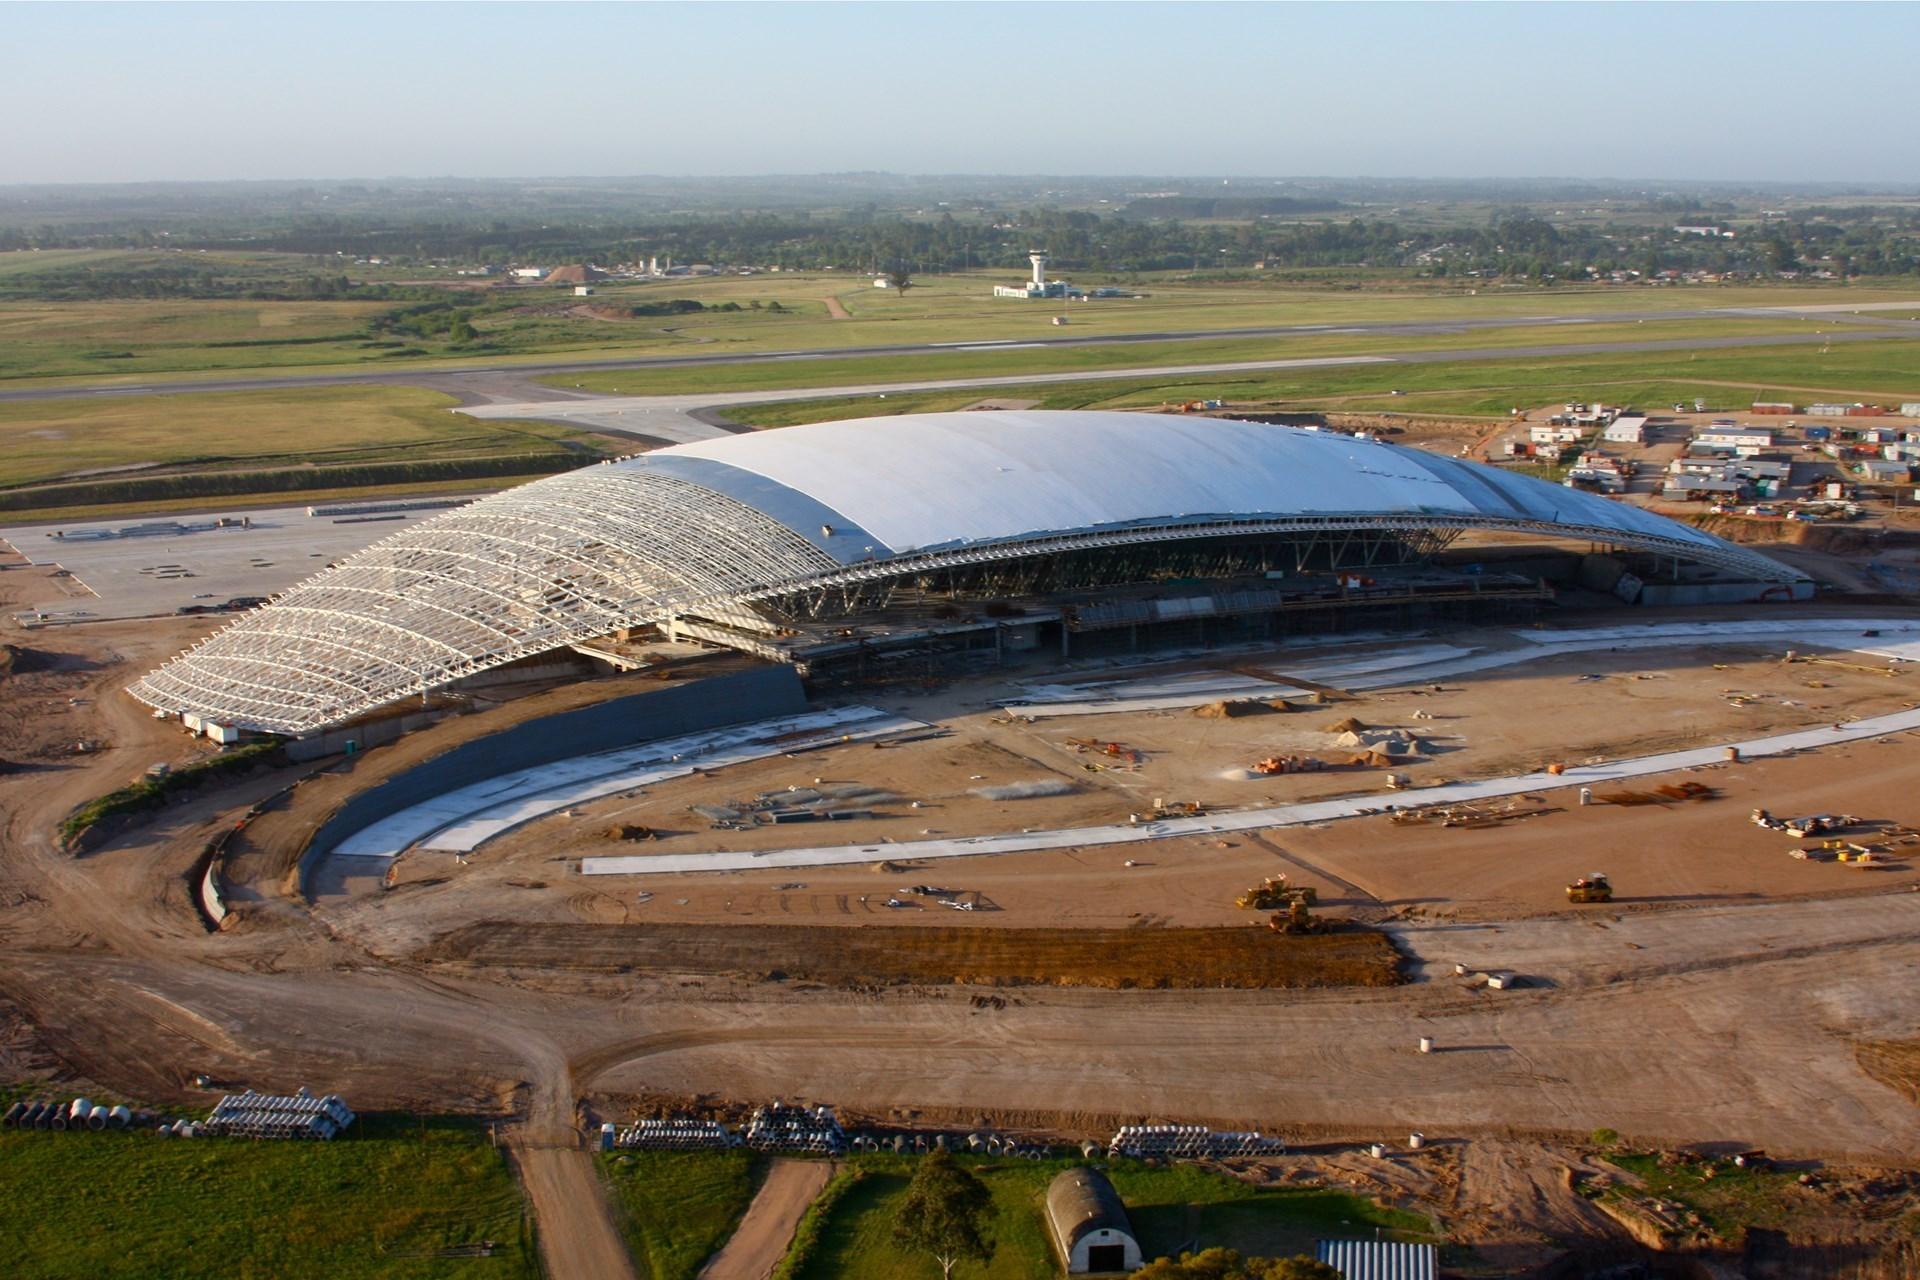 Imagen de Aeropuerto de Carrasco